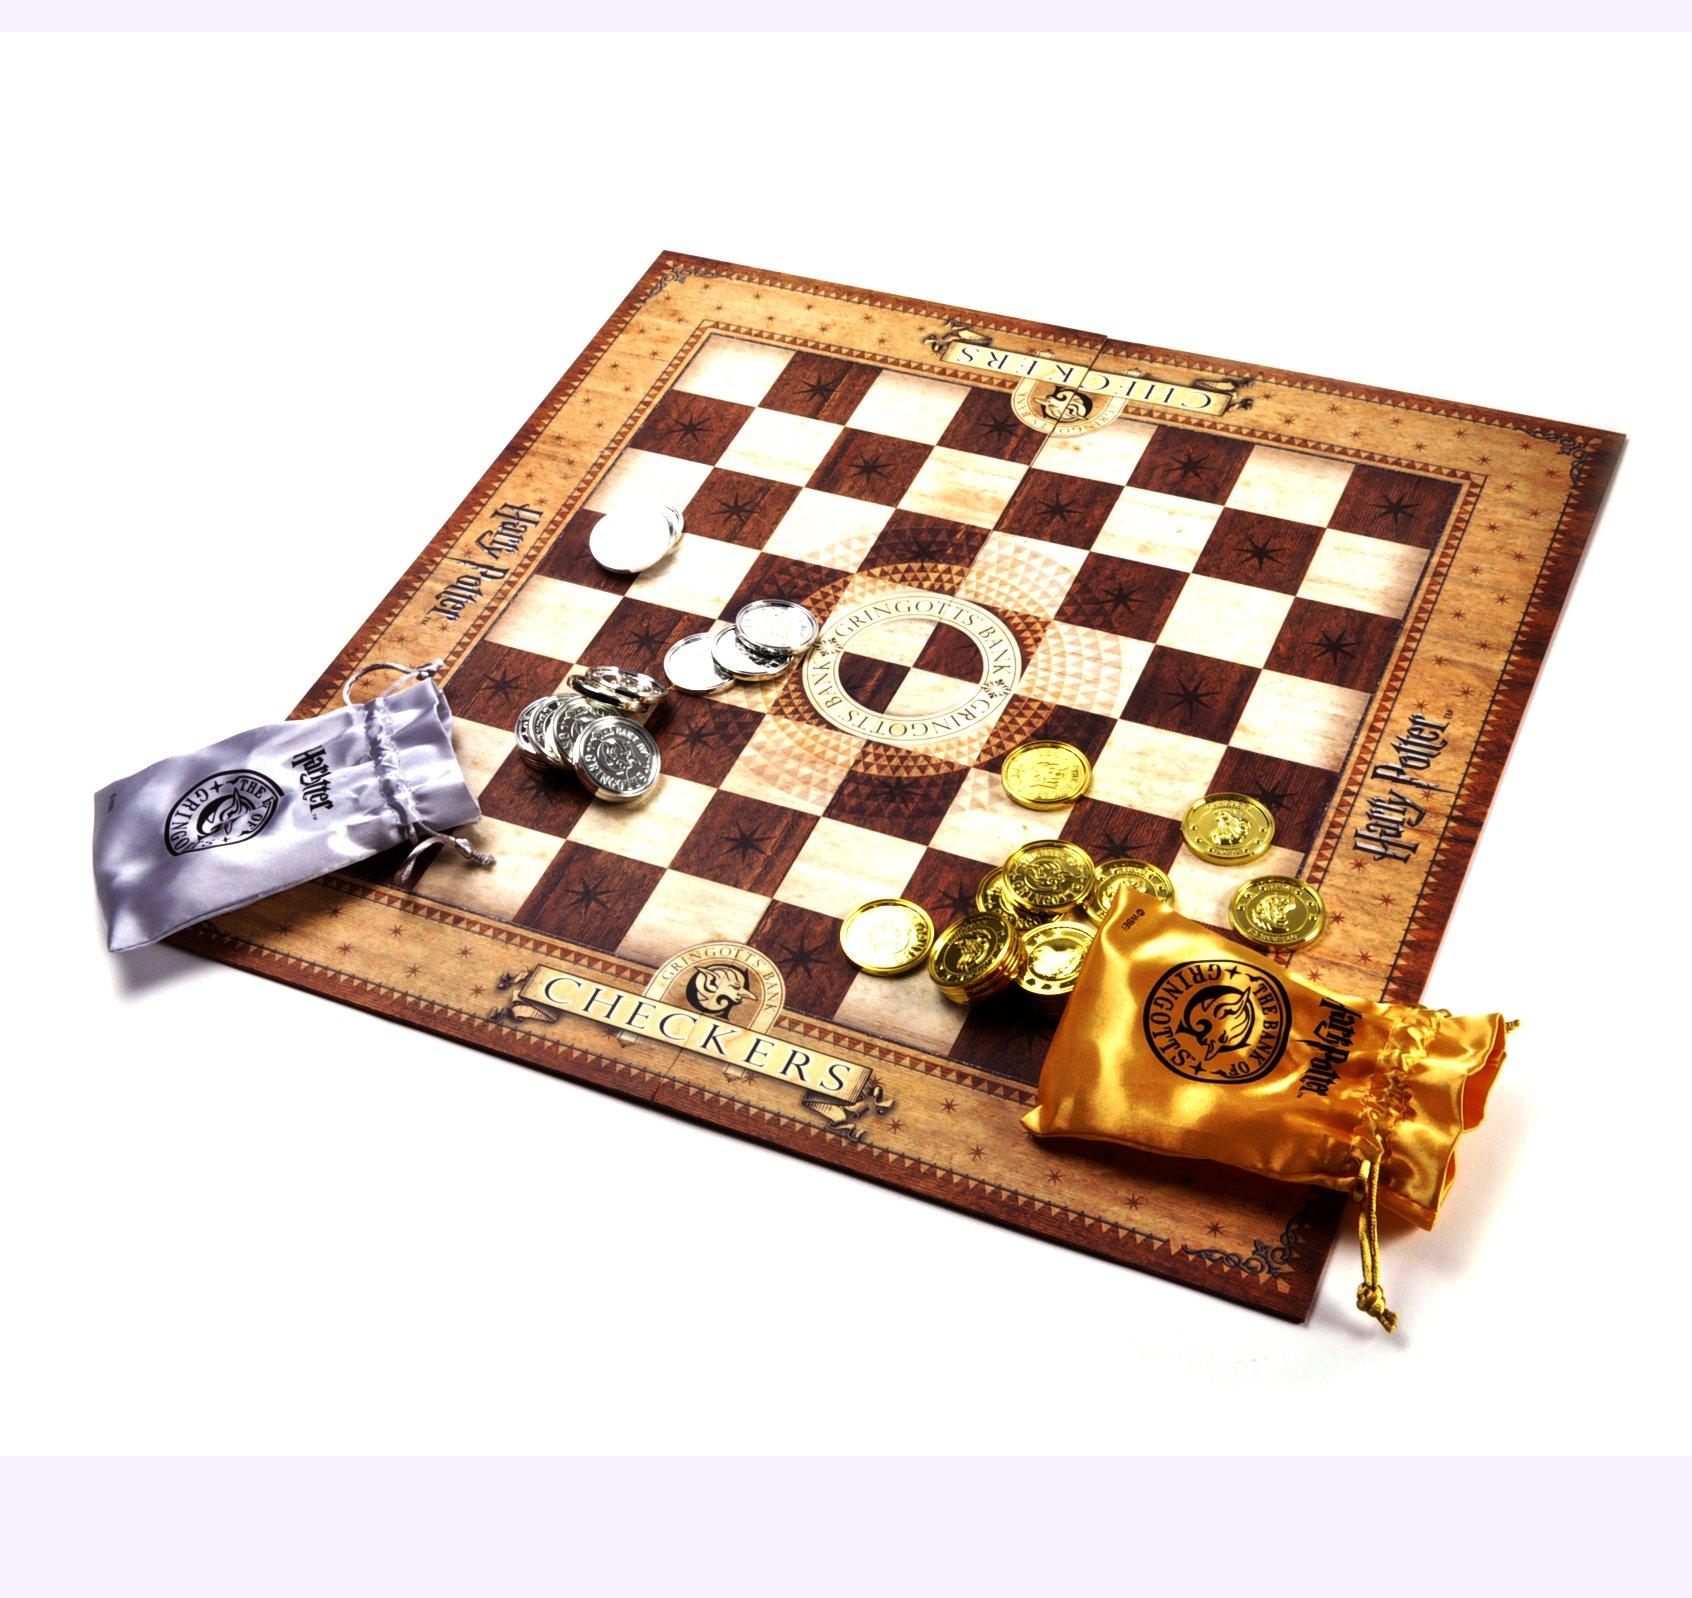 Noble Harry Potter Gringotts Bank Checkers Set